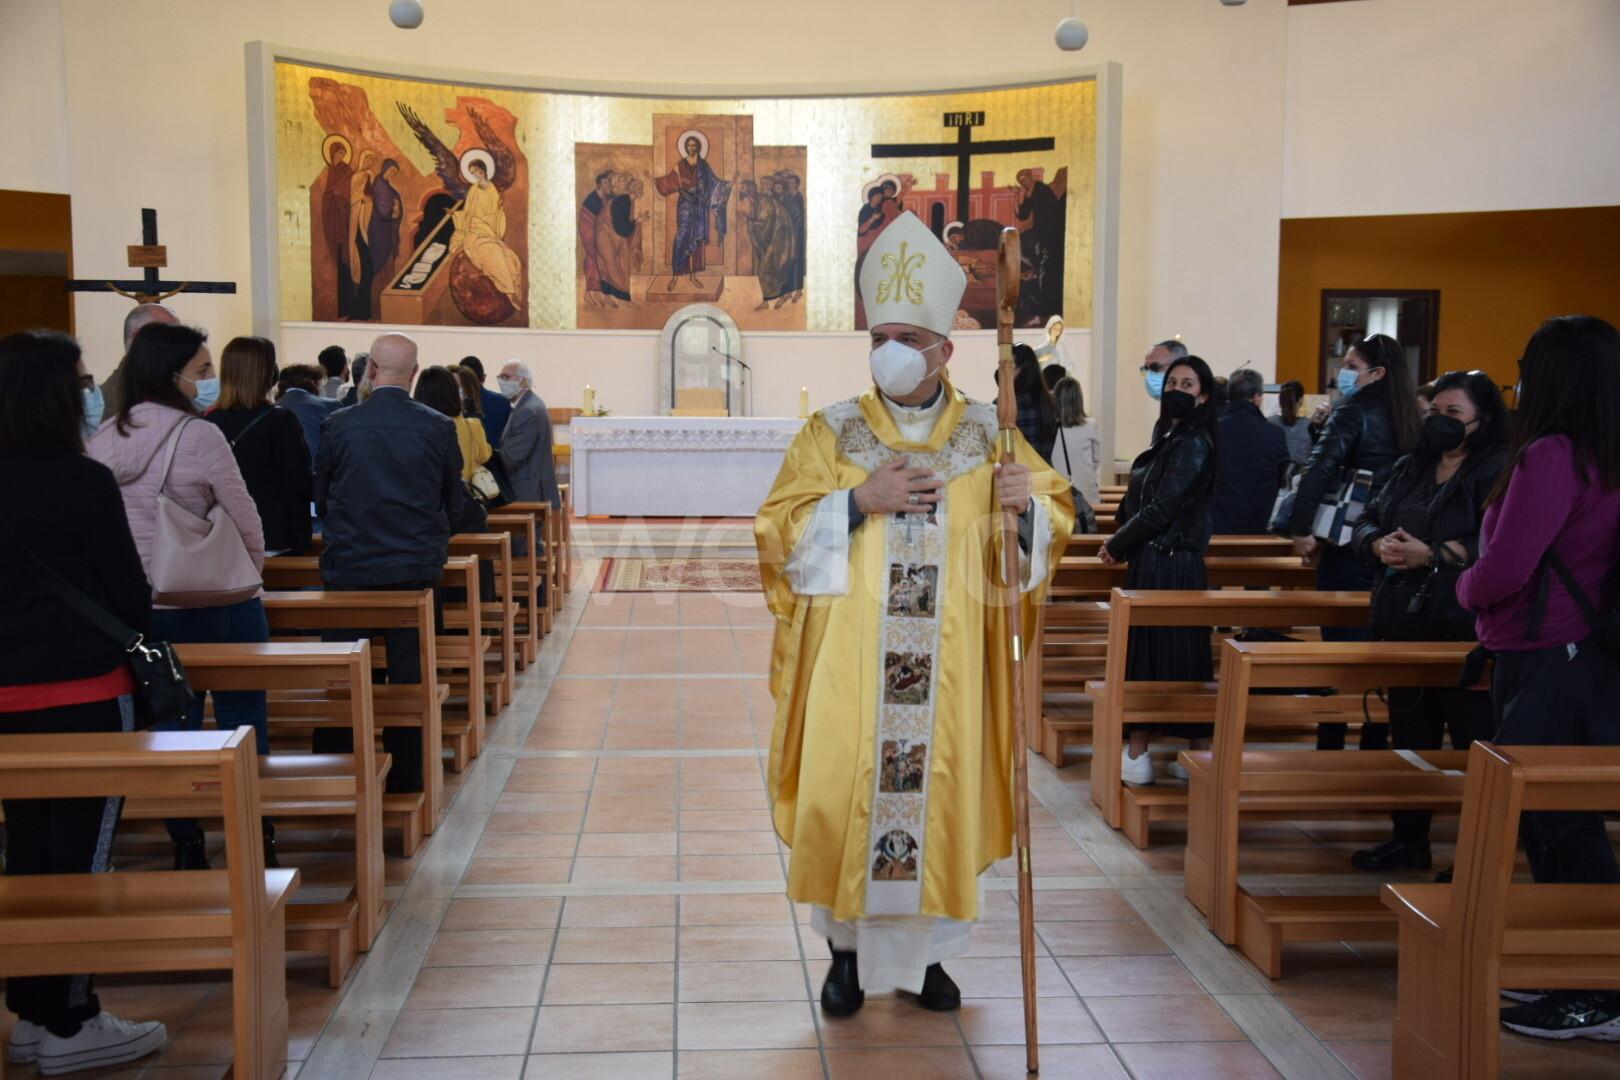 Monsignor Panzetta